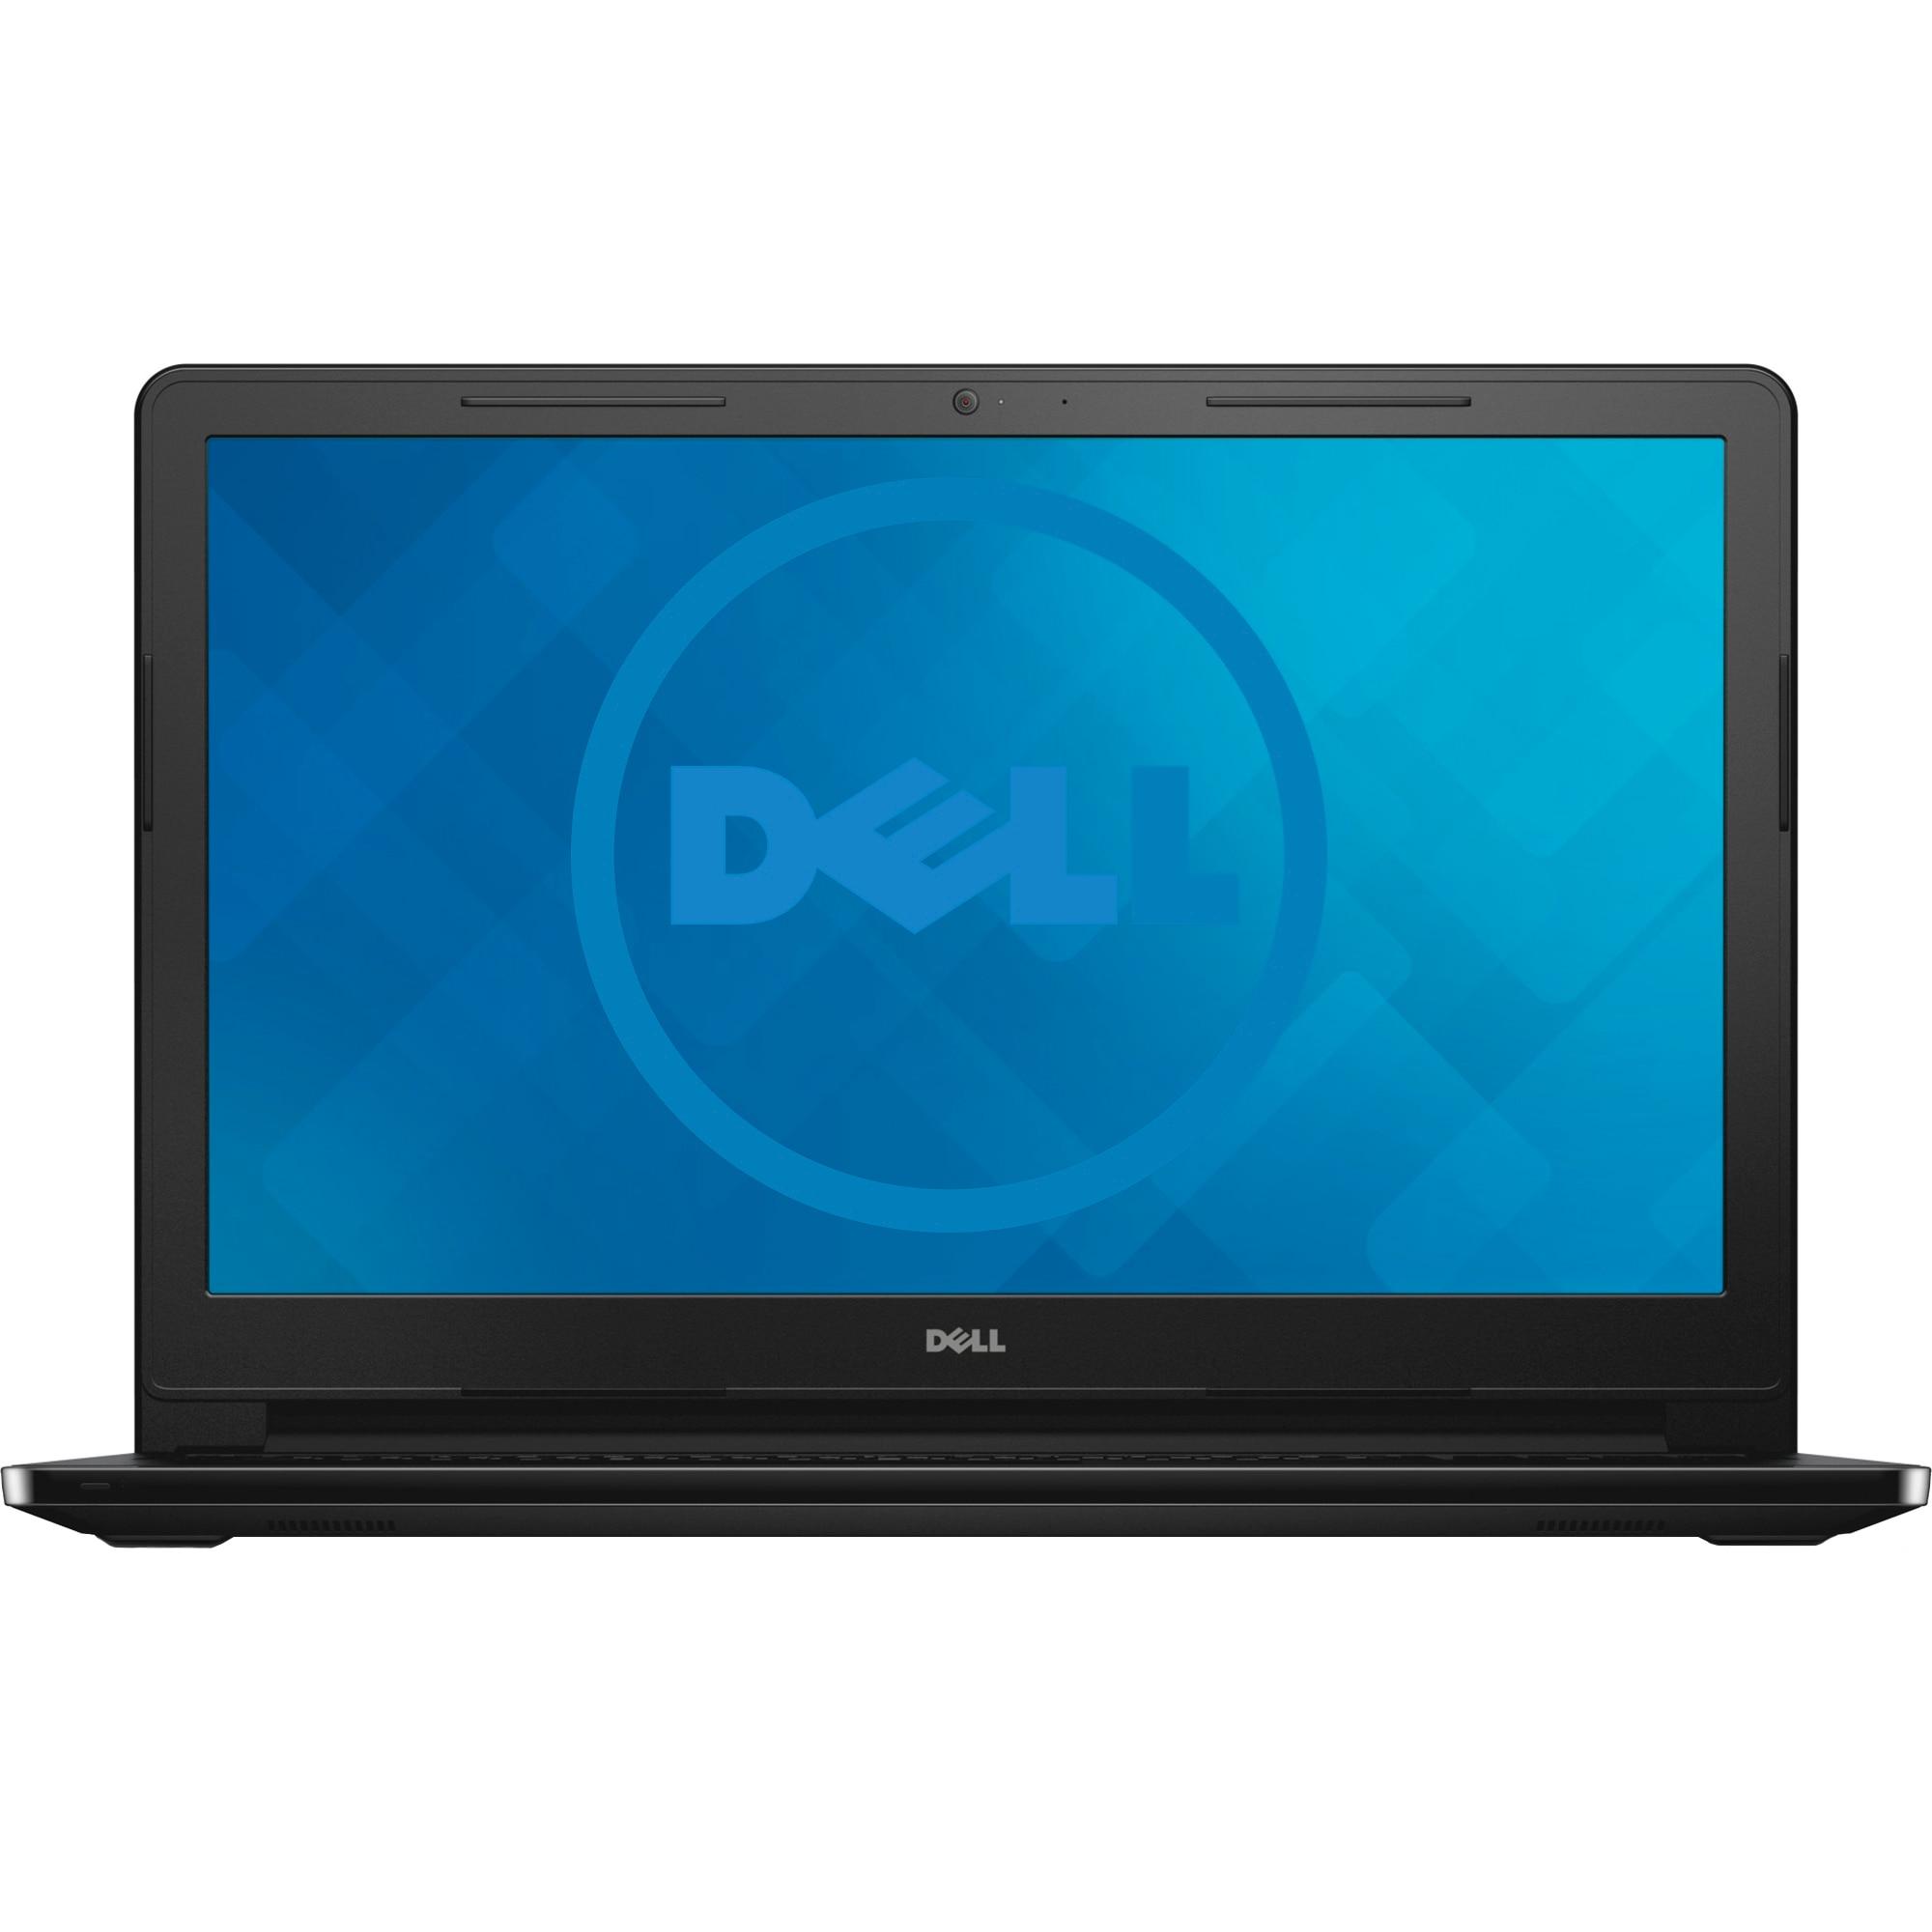 "Fotografie Laptop Dell Inspiron Inspiron 3552 cu procesor Intel Celeron N3060, 15.6"", HD, 4GB, 500Gb HDD, Intel UHD Graphics, Ubuntu, Black"